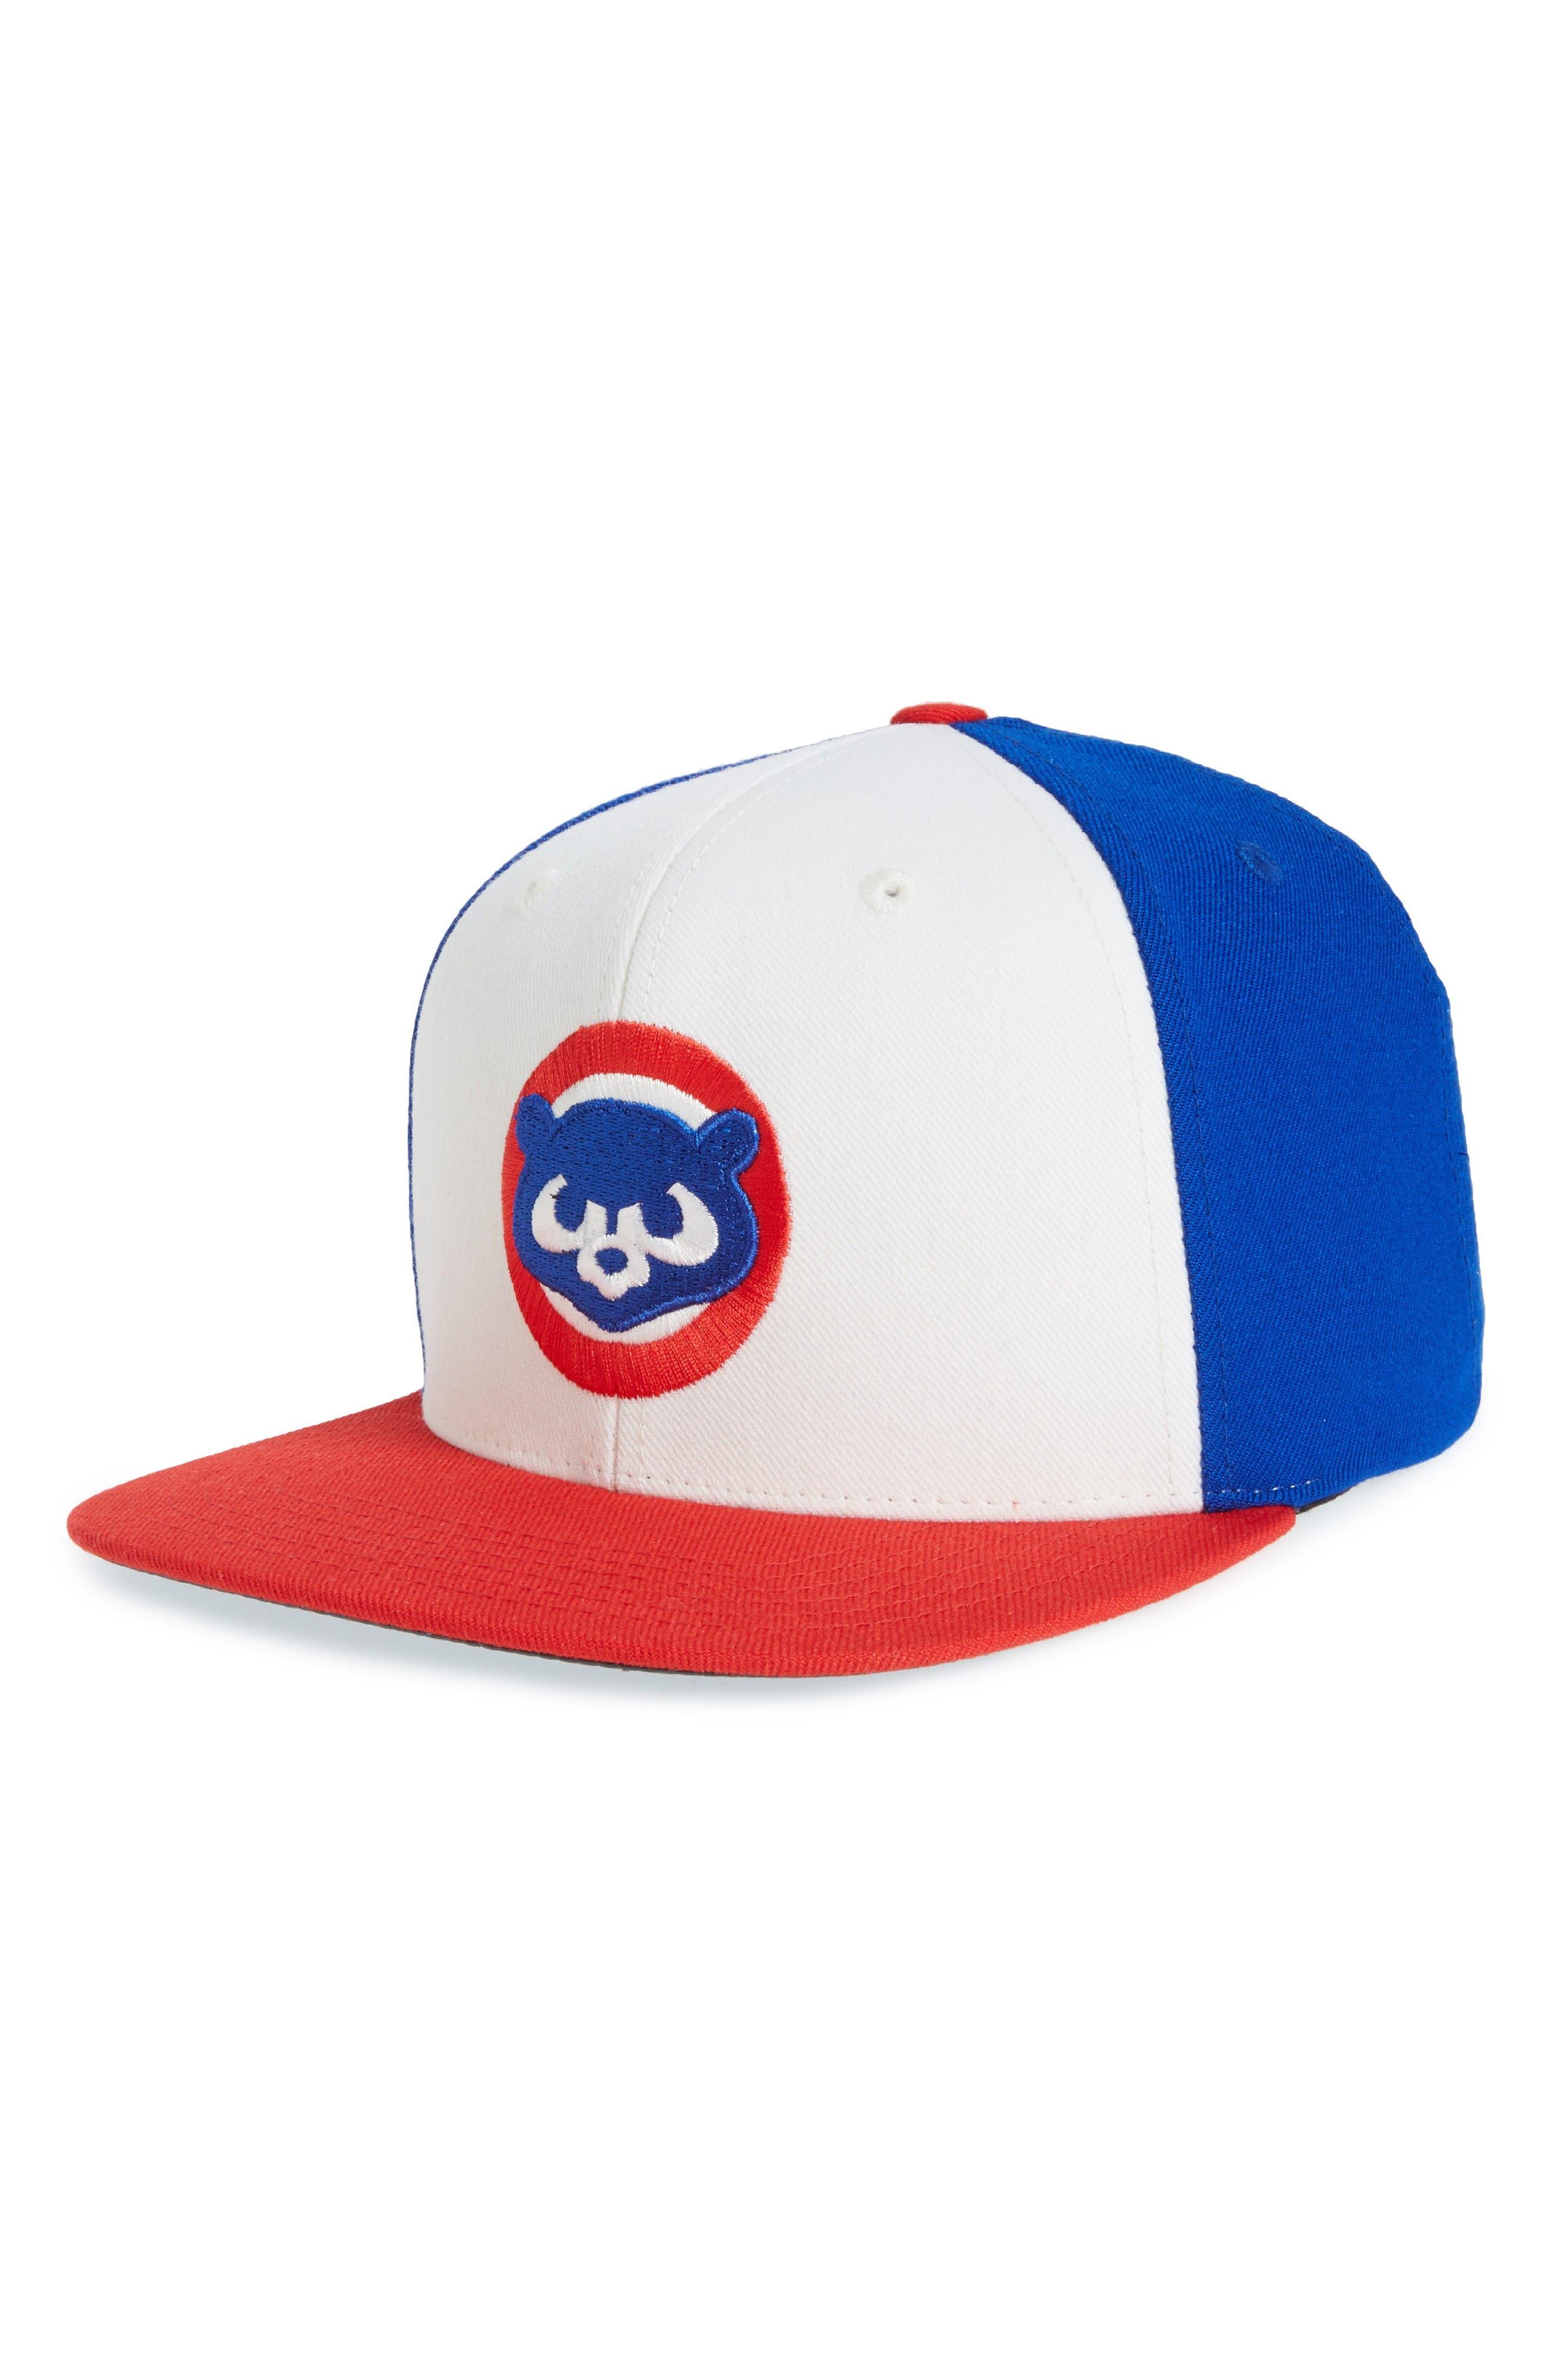 AMERICAN NEEDLE The Big Show MLB Snapback Baseball Cap